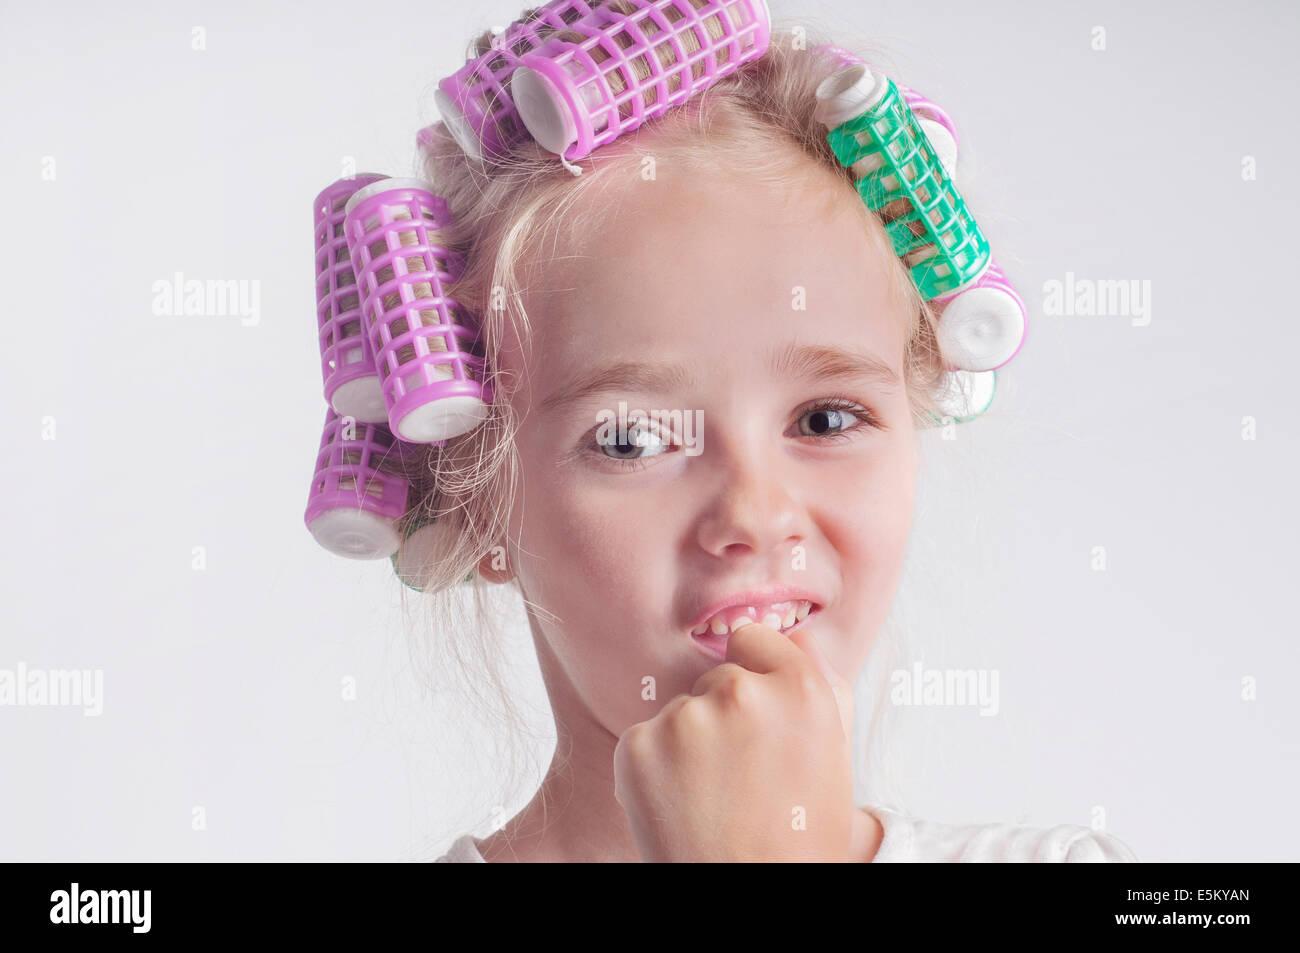 Cute girl portrait enfant in curlers Photo Stock